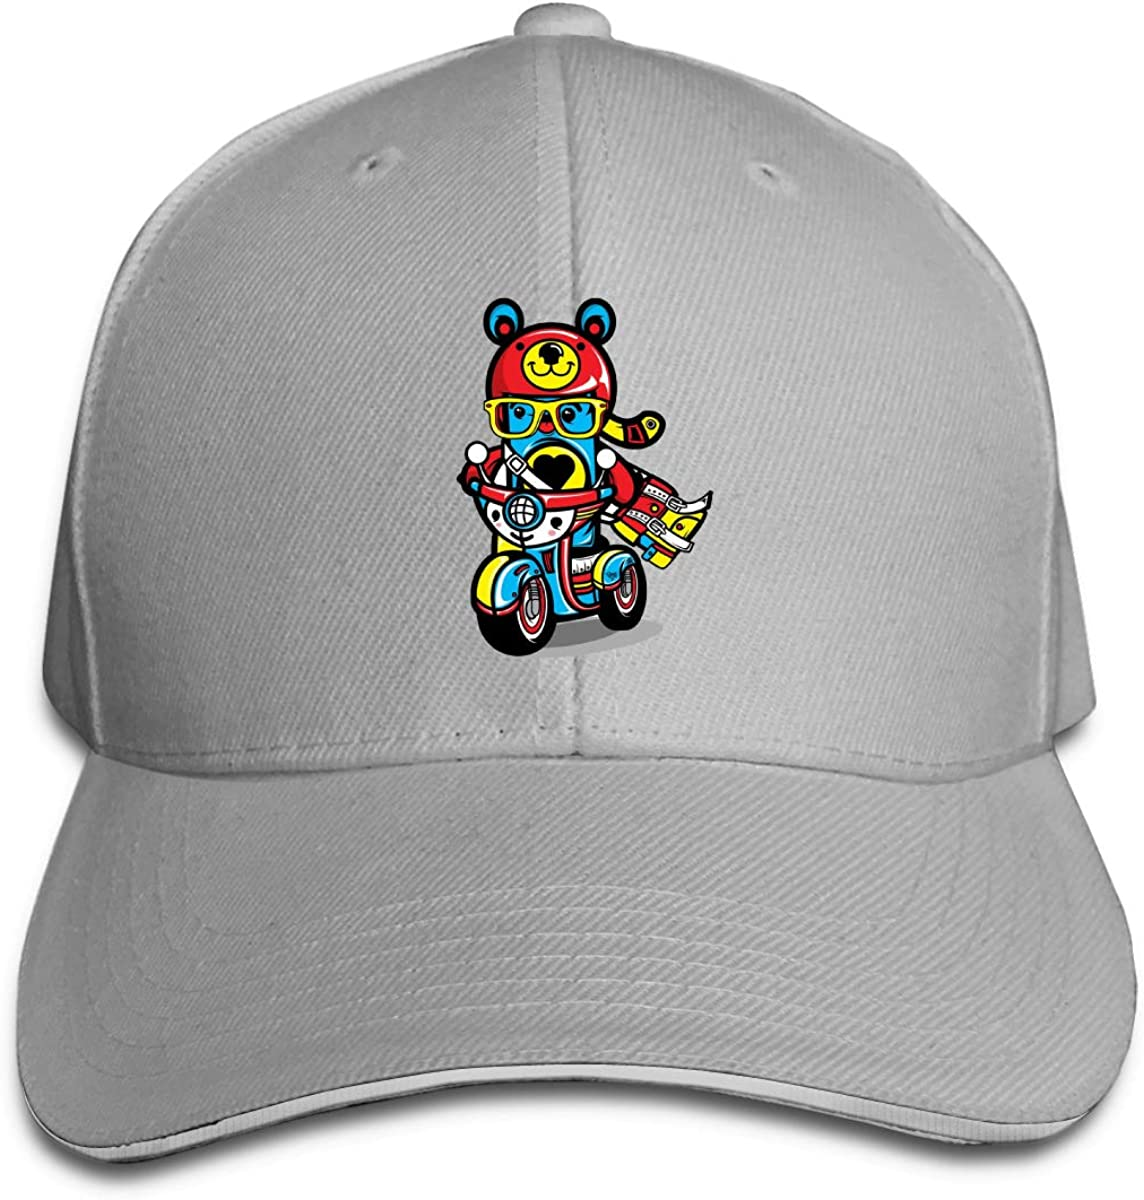 ChocoToy Classic Adjustable Cotton Baseball Caps Trucker Driver Hat Outdoor Cap Gray